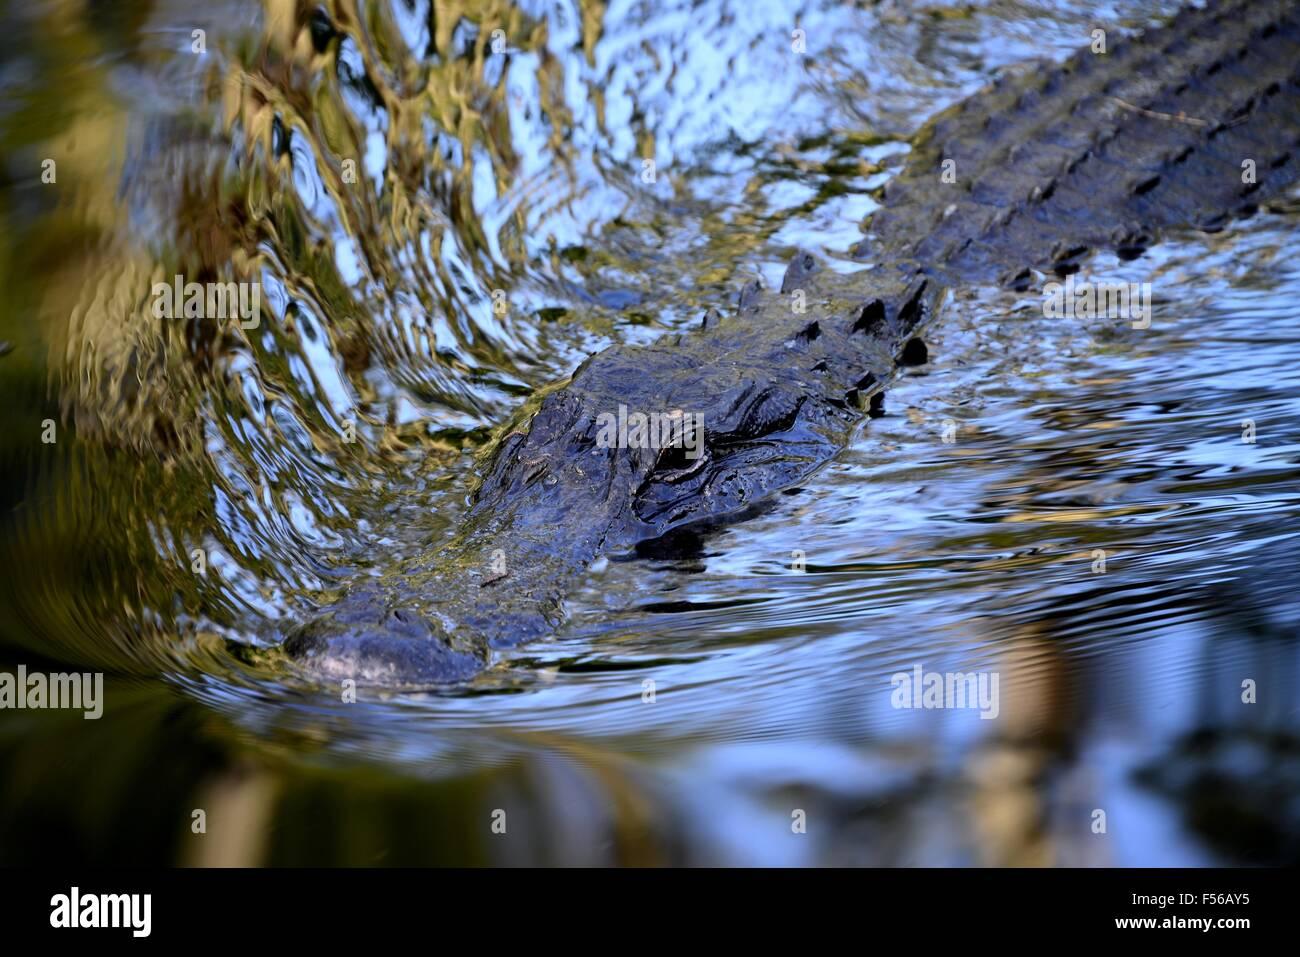 Florida Gator! - Stock Image